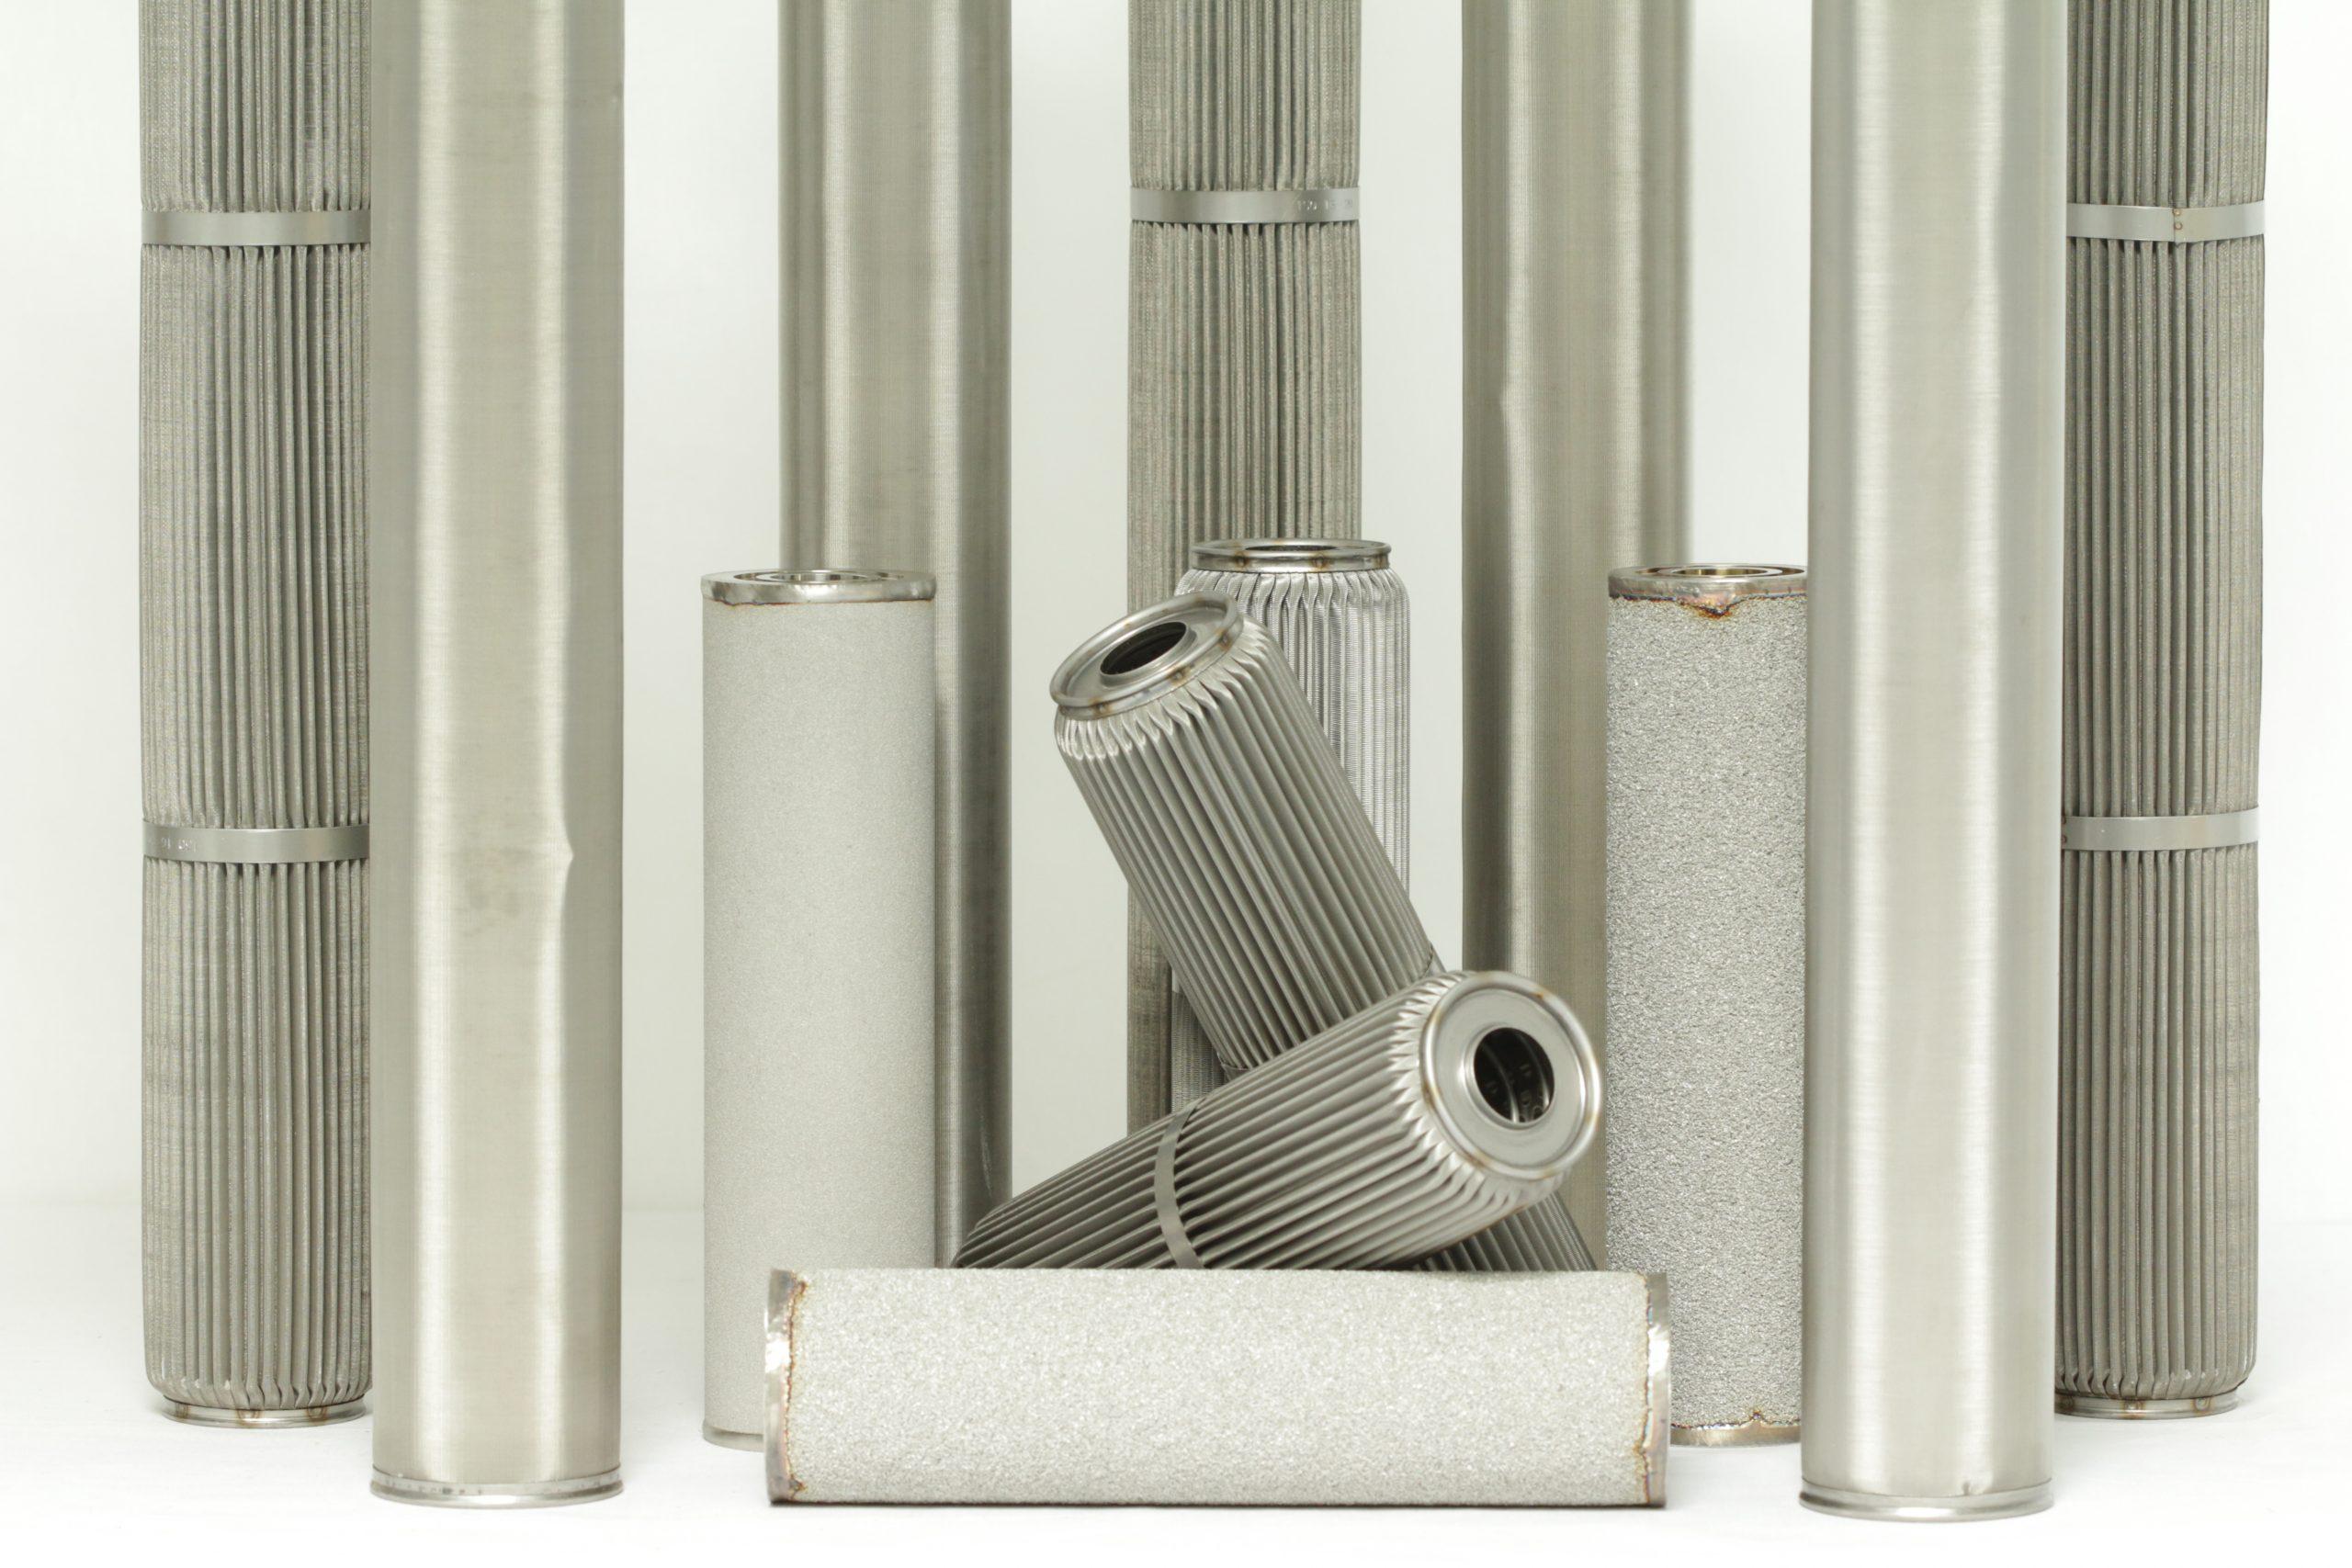 metal cartridge filters